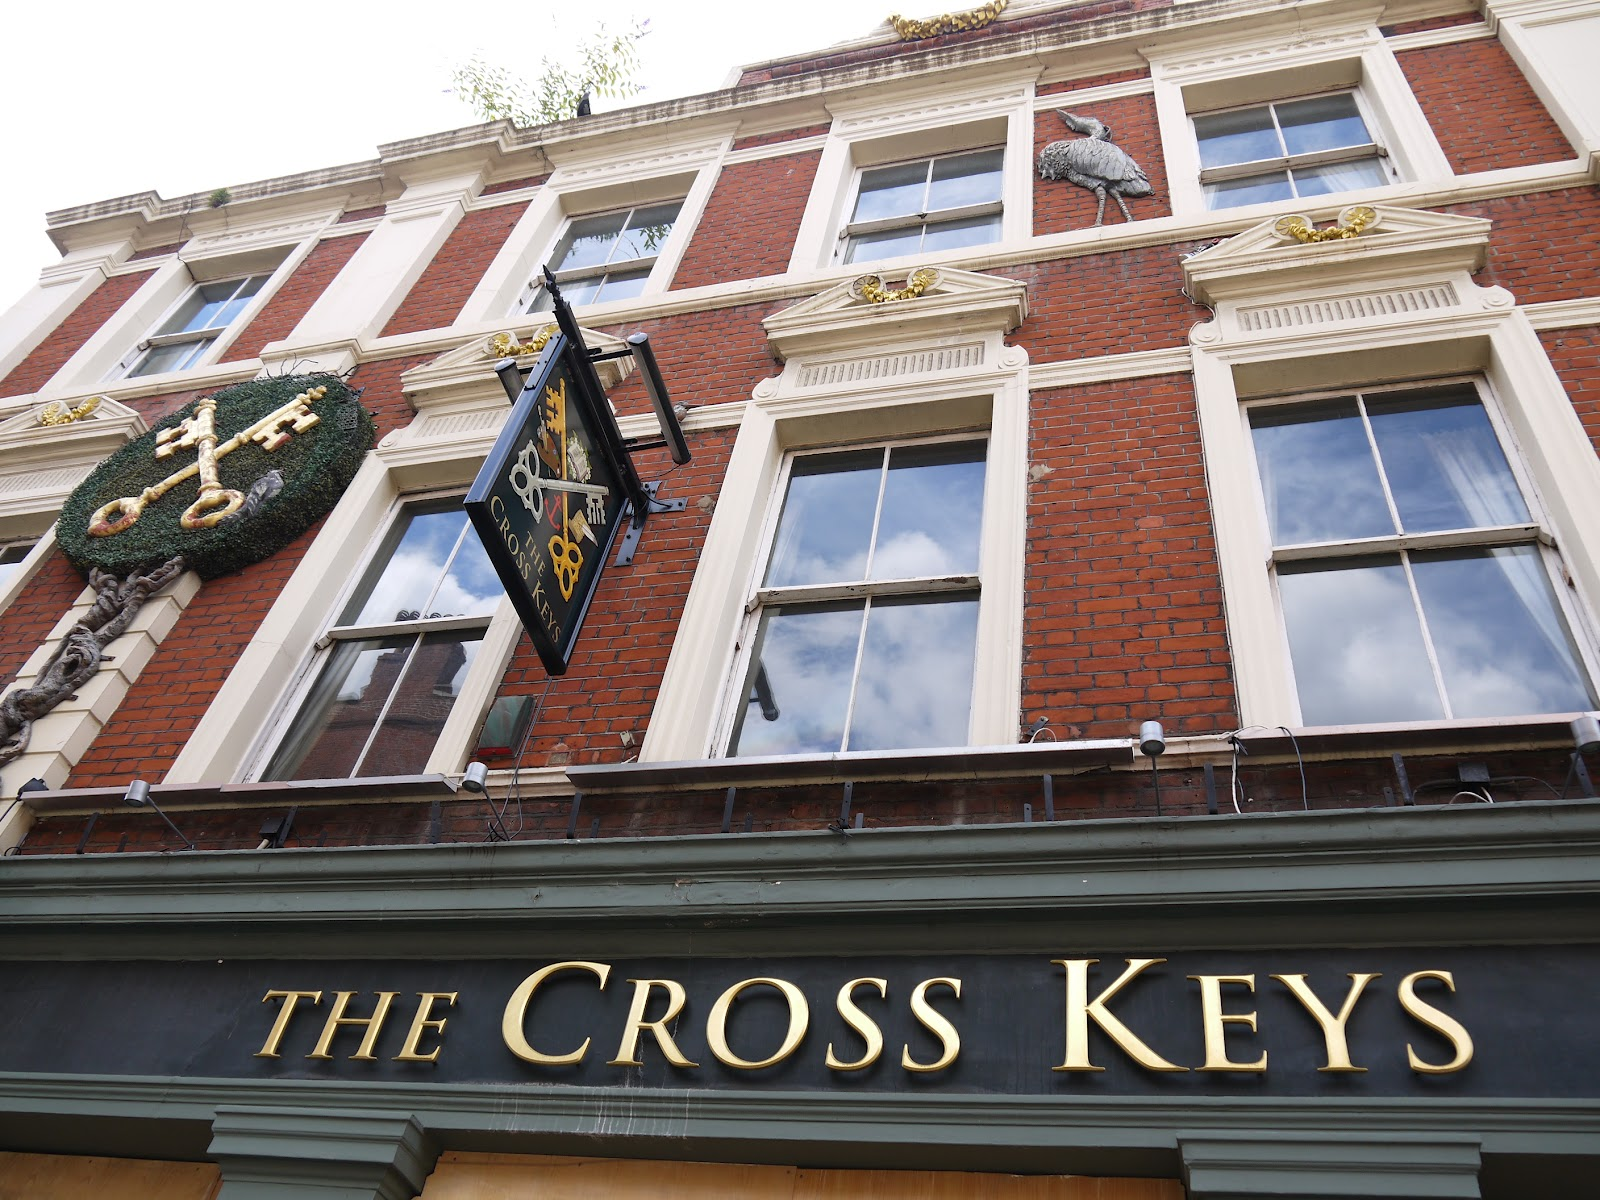 The Cross Keys Chelsea